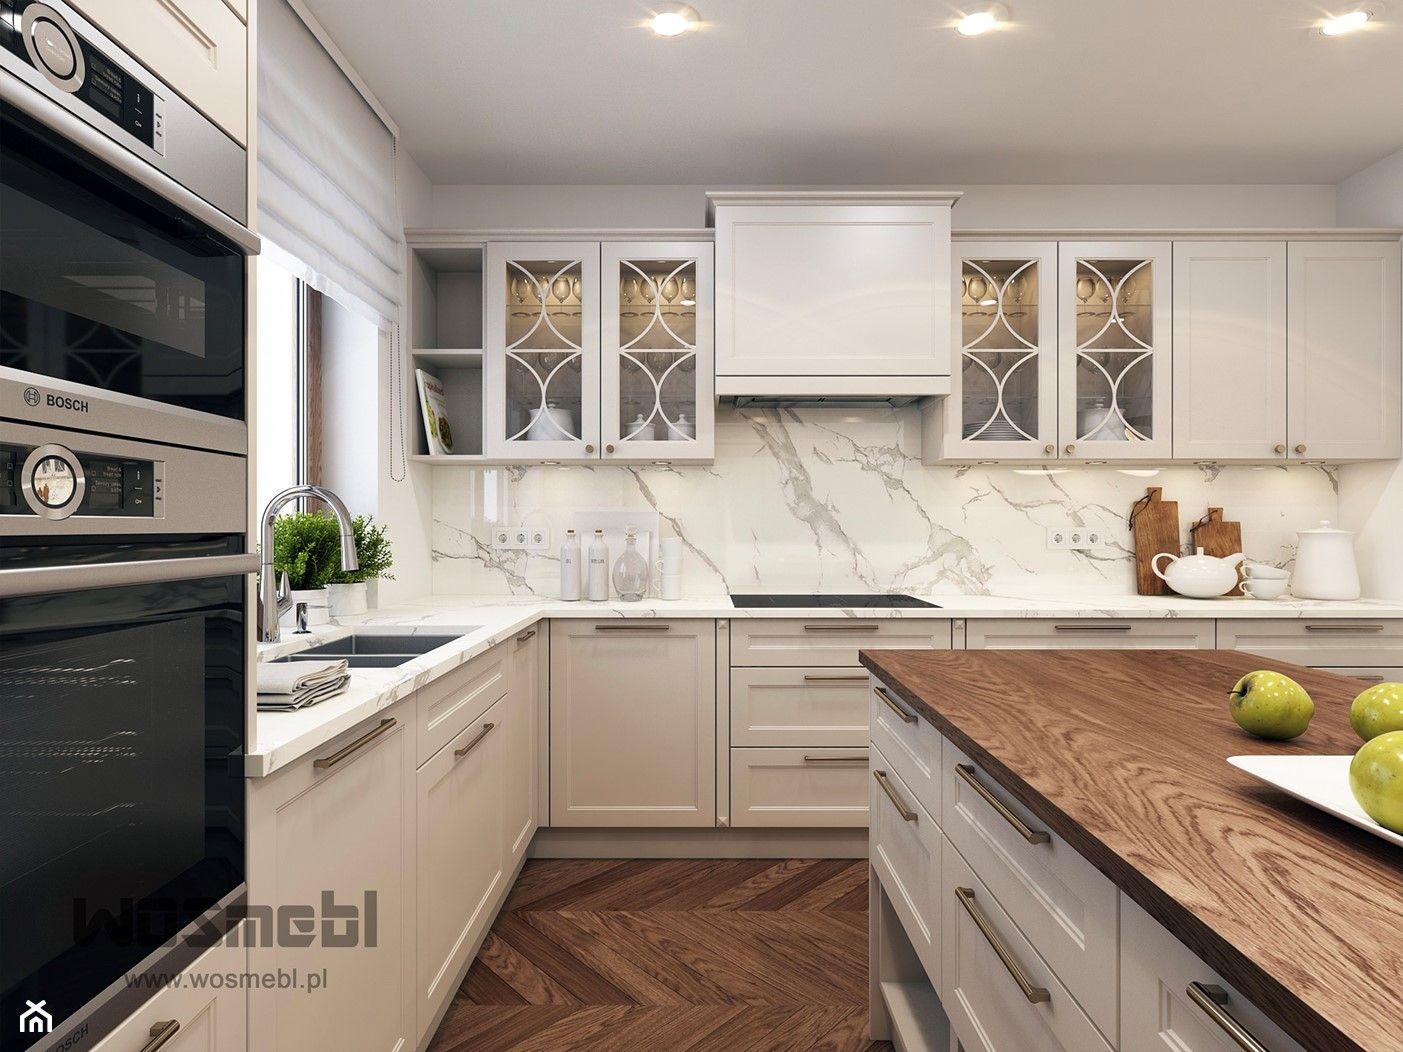 Pin By Patrycja On Nowoczesne Kuchnie Kitchen Kitchen Cabinets Home Decor